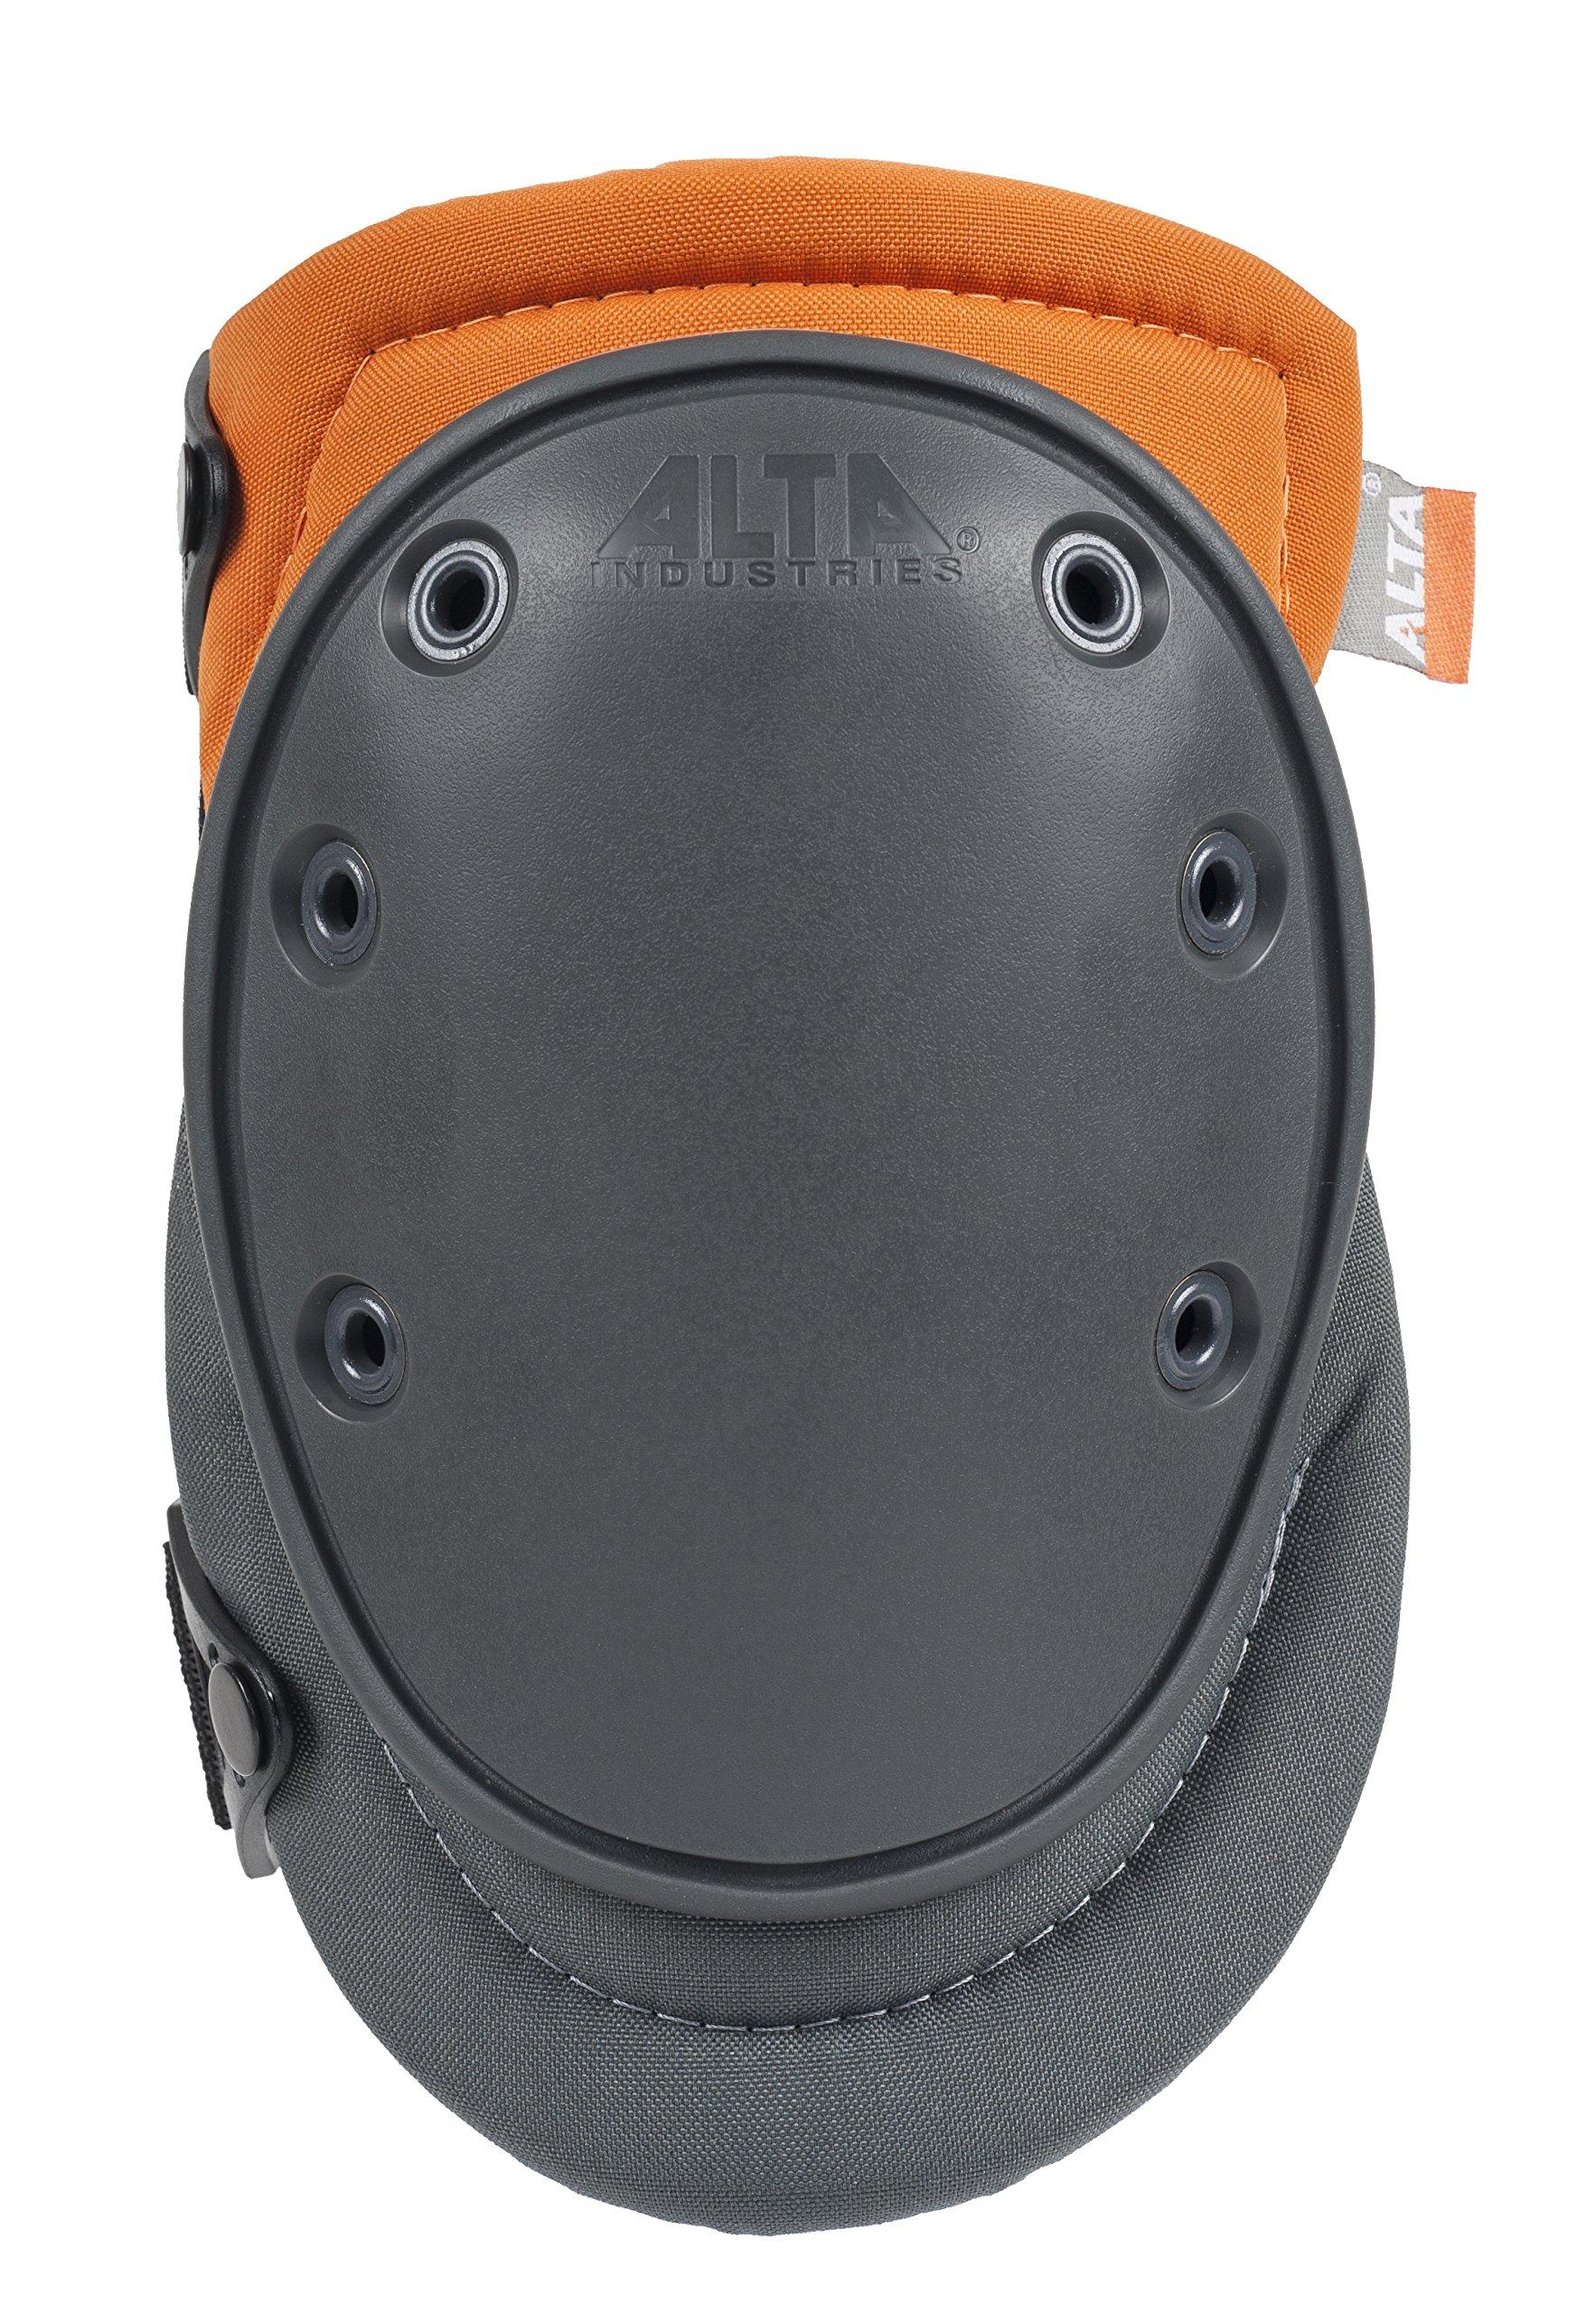 ALTA 50453.50 AltaFLEX Gel Knee Protector Pad, Gray/Orange Cordura Nylon Fabric, AltaLOK Fastening, Flexible Cap, Long, Gray by Alta